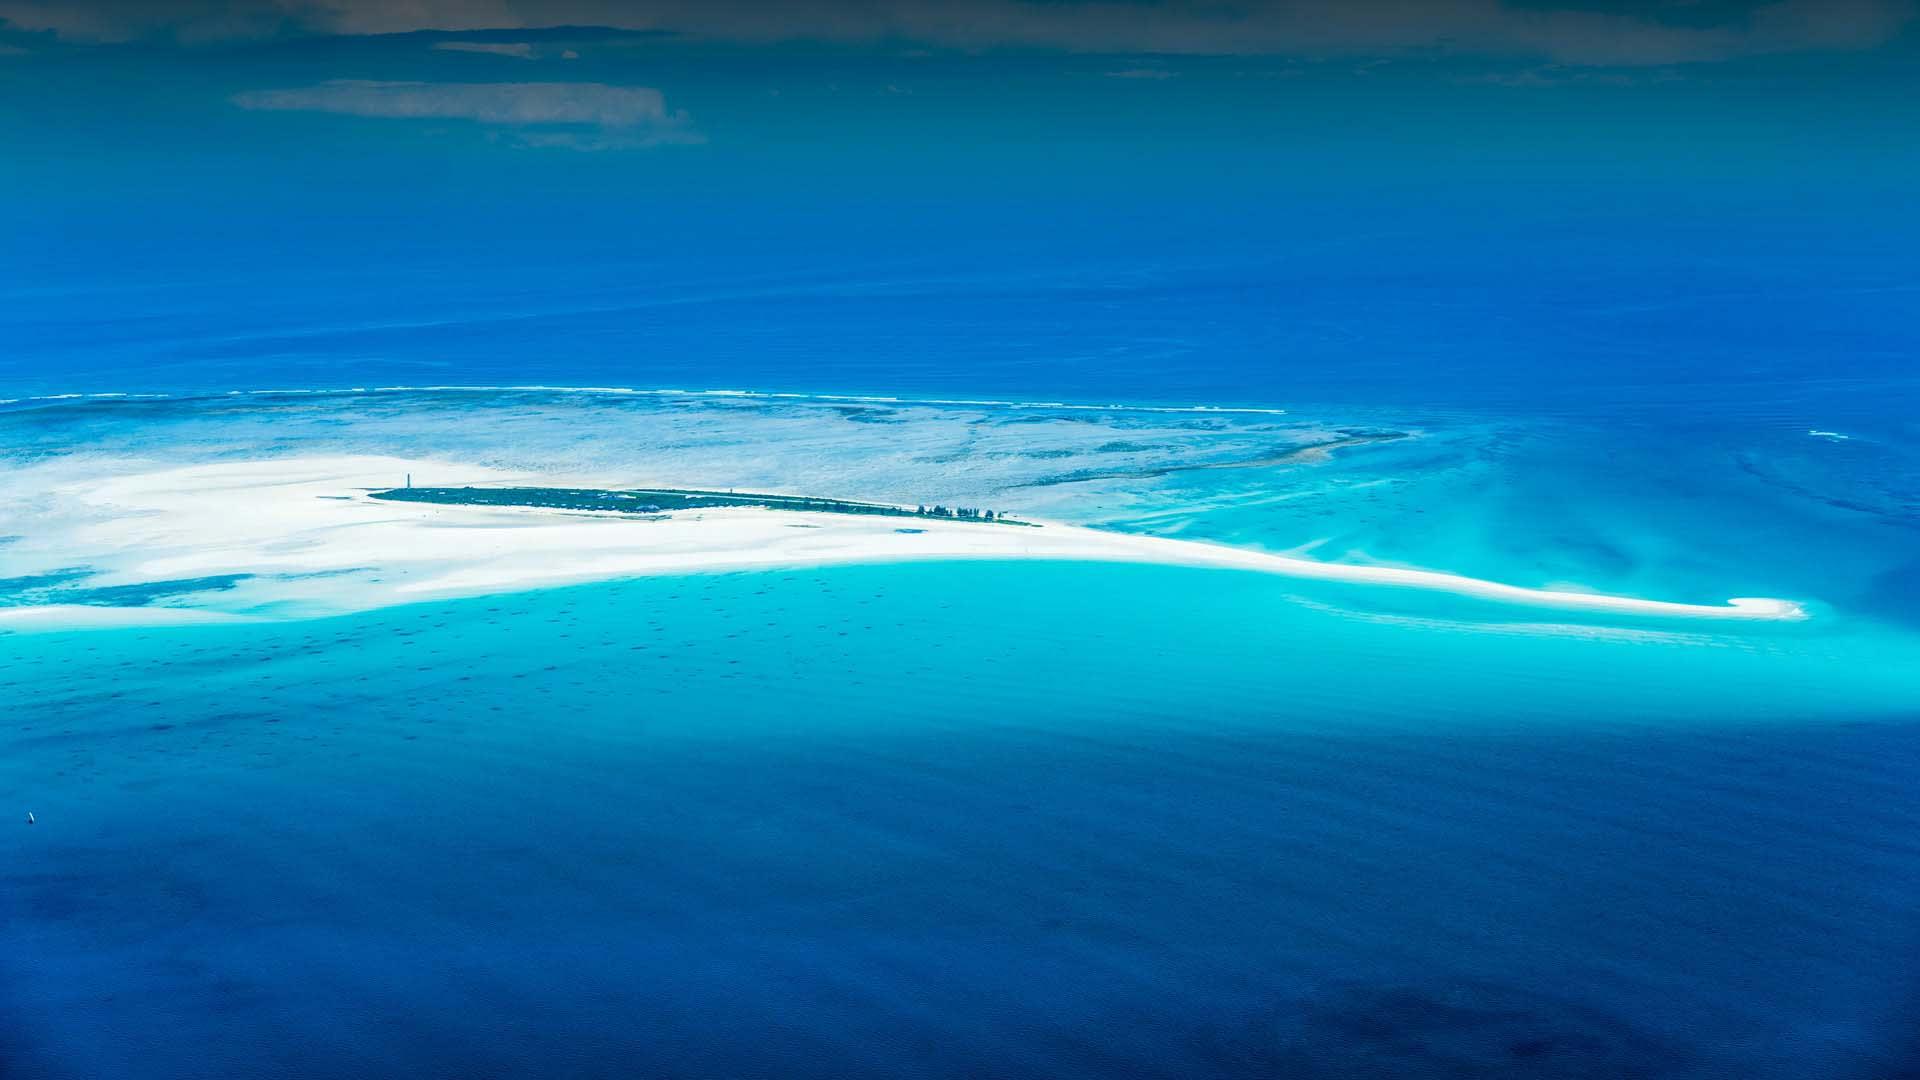 https://assets.anantara.com/image/upload/q_auto/media/minor/anantara/images/anantara-medjumbe-island-resort/the-resort/desktop-banner/anantara_medjumbe_island_island_ariel_header_1920x1080.jpg